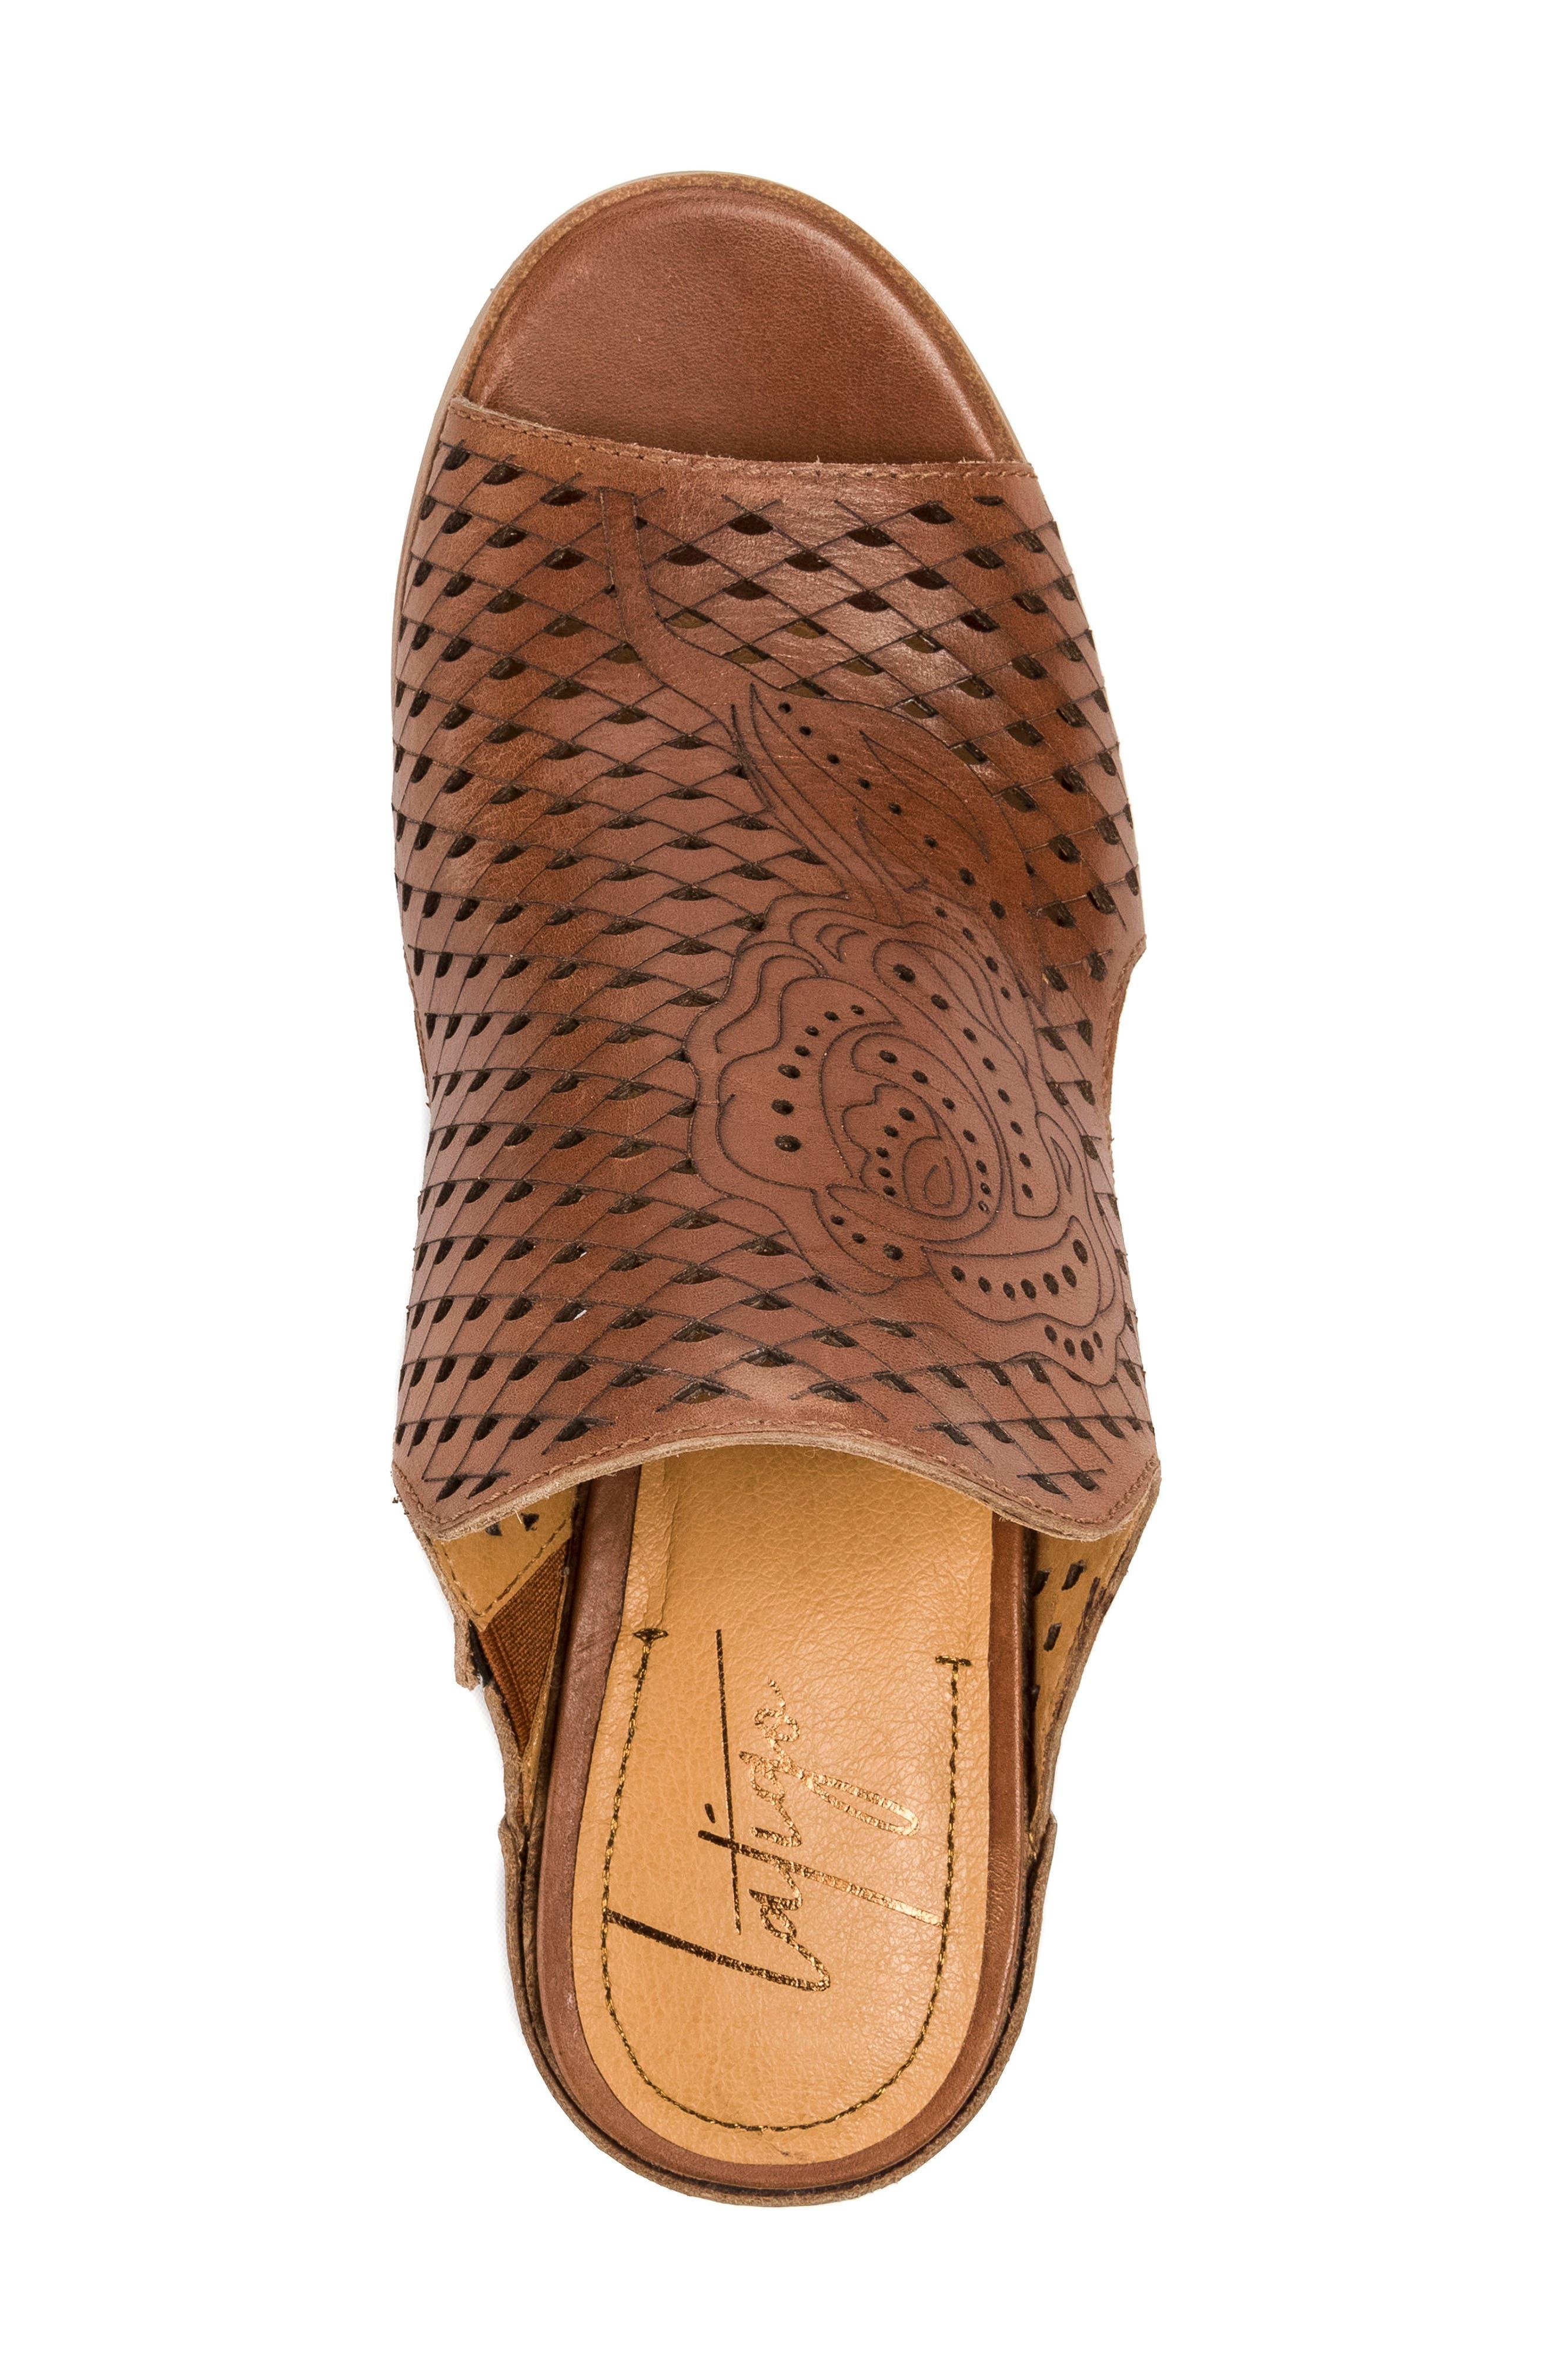 Janis Laser Cut Wedge Sandal,                             Alternate thumbnail 5, color,                             Brush Brown Leather